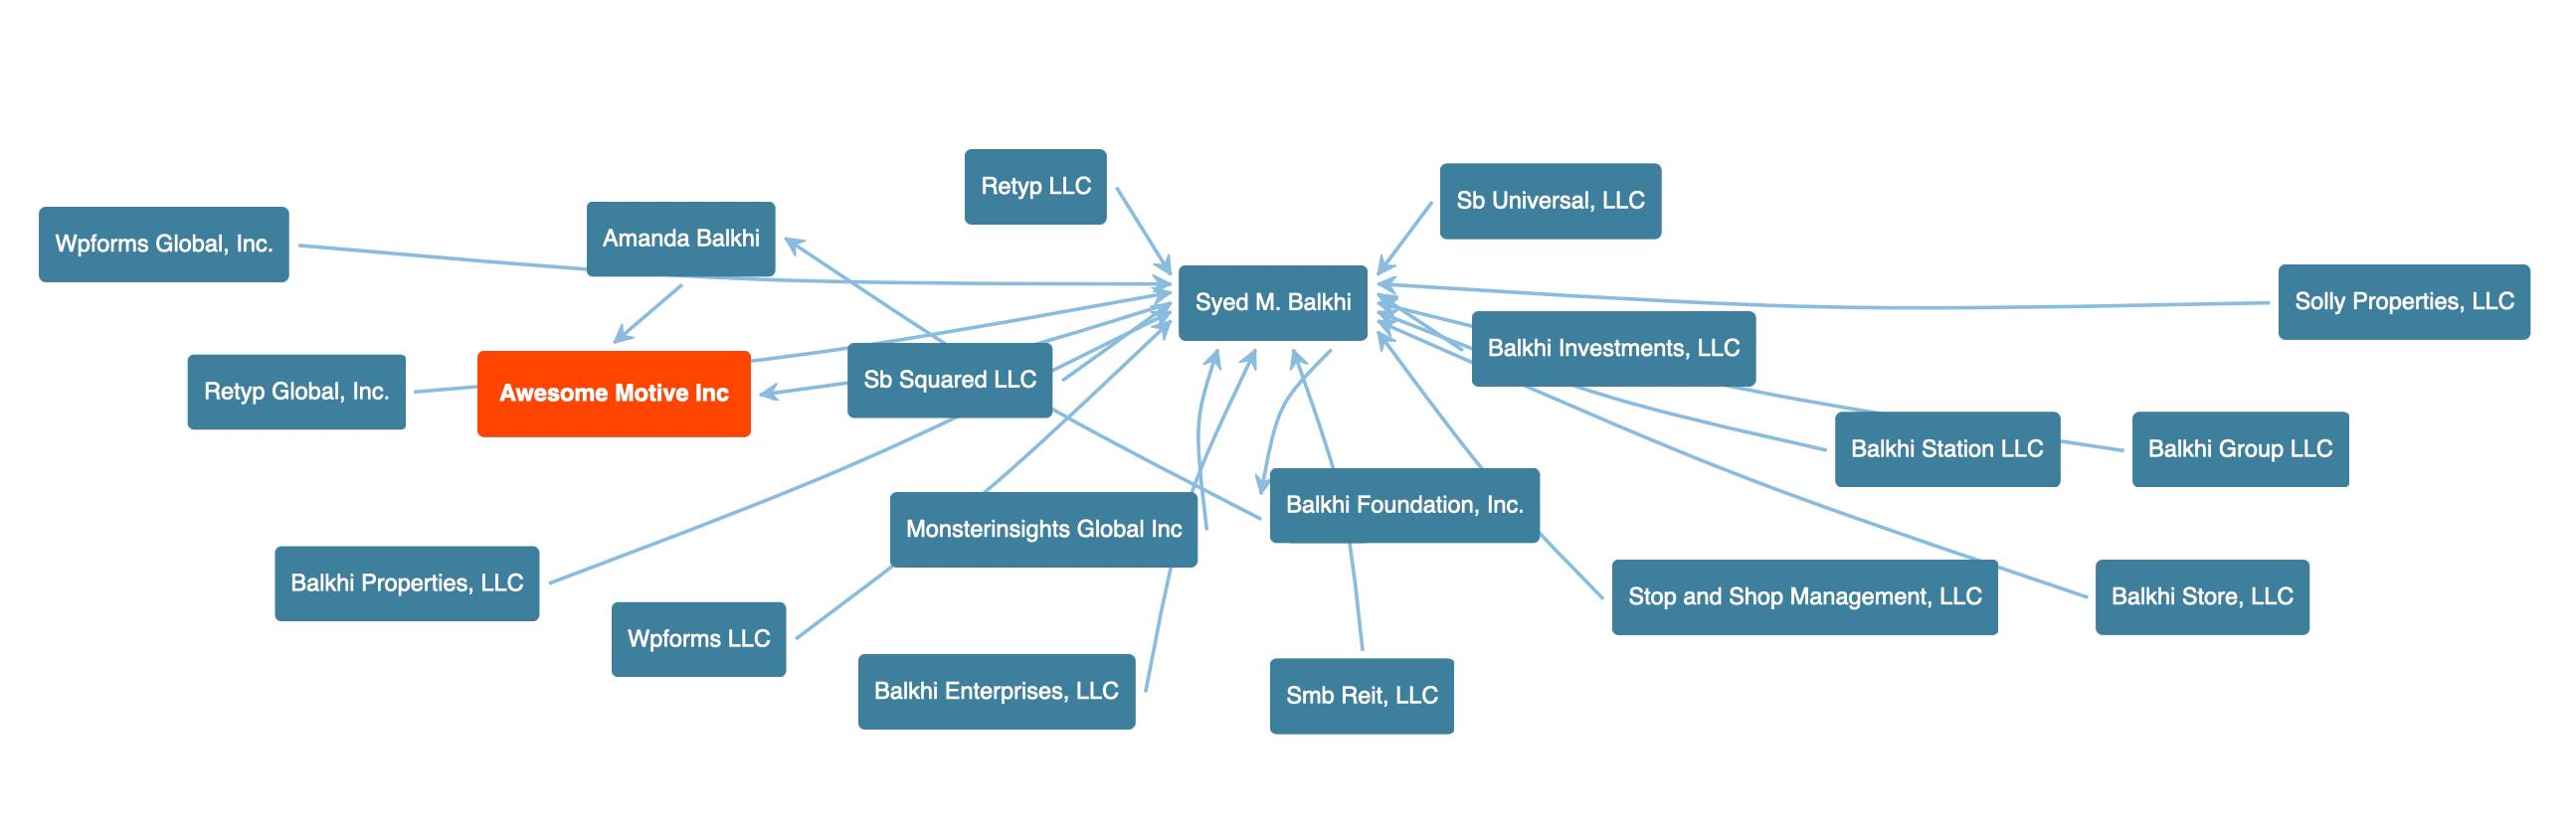 Awesome Motive and Syed Balkhi's organizational chart.